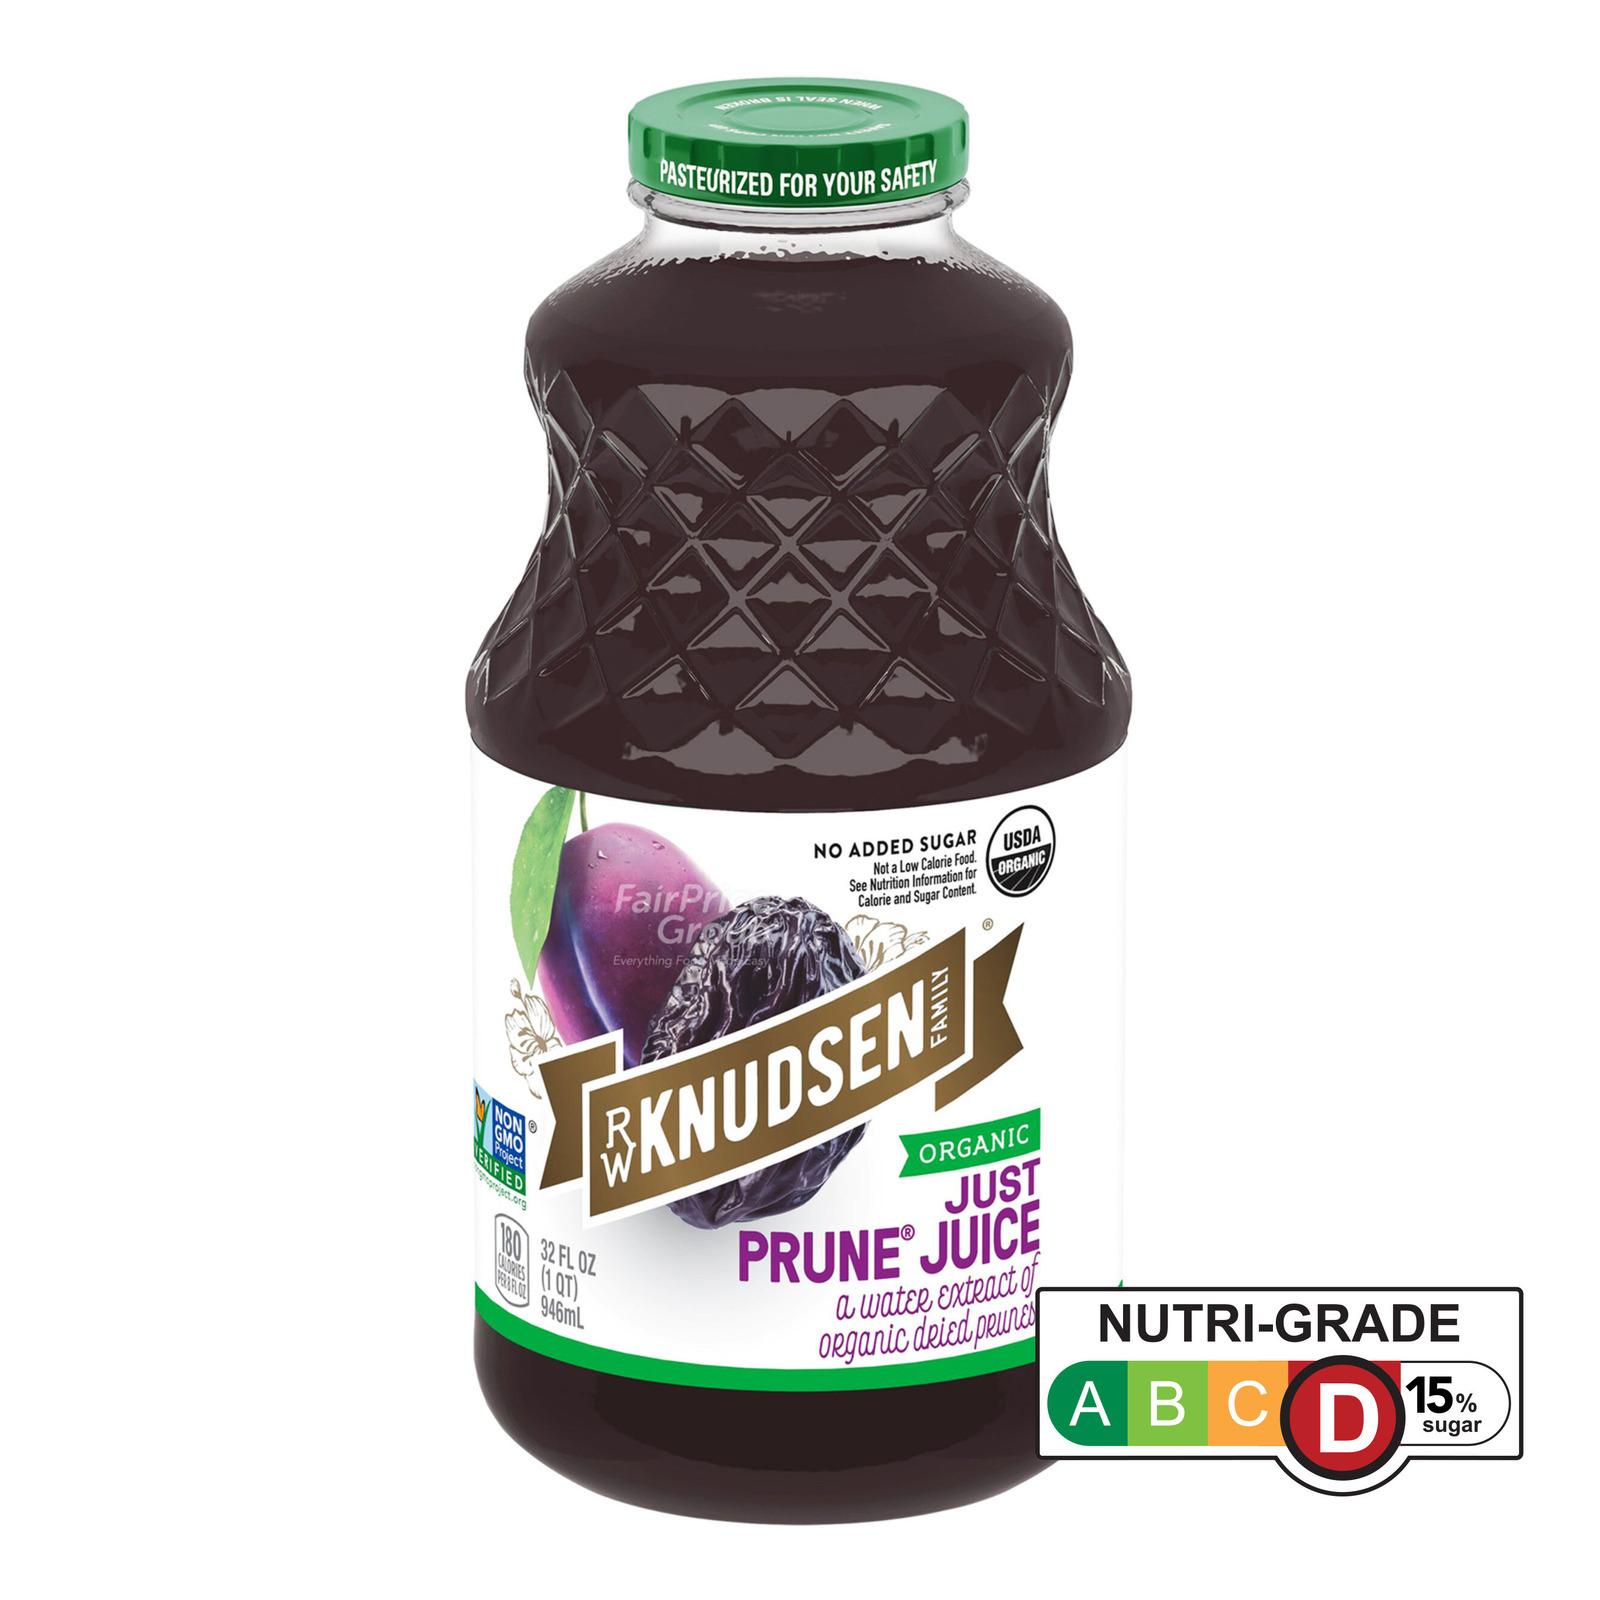 R.W. Knudsen Family Organic 100% Bottle Juice - Just Prune